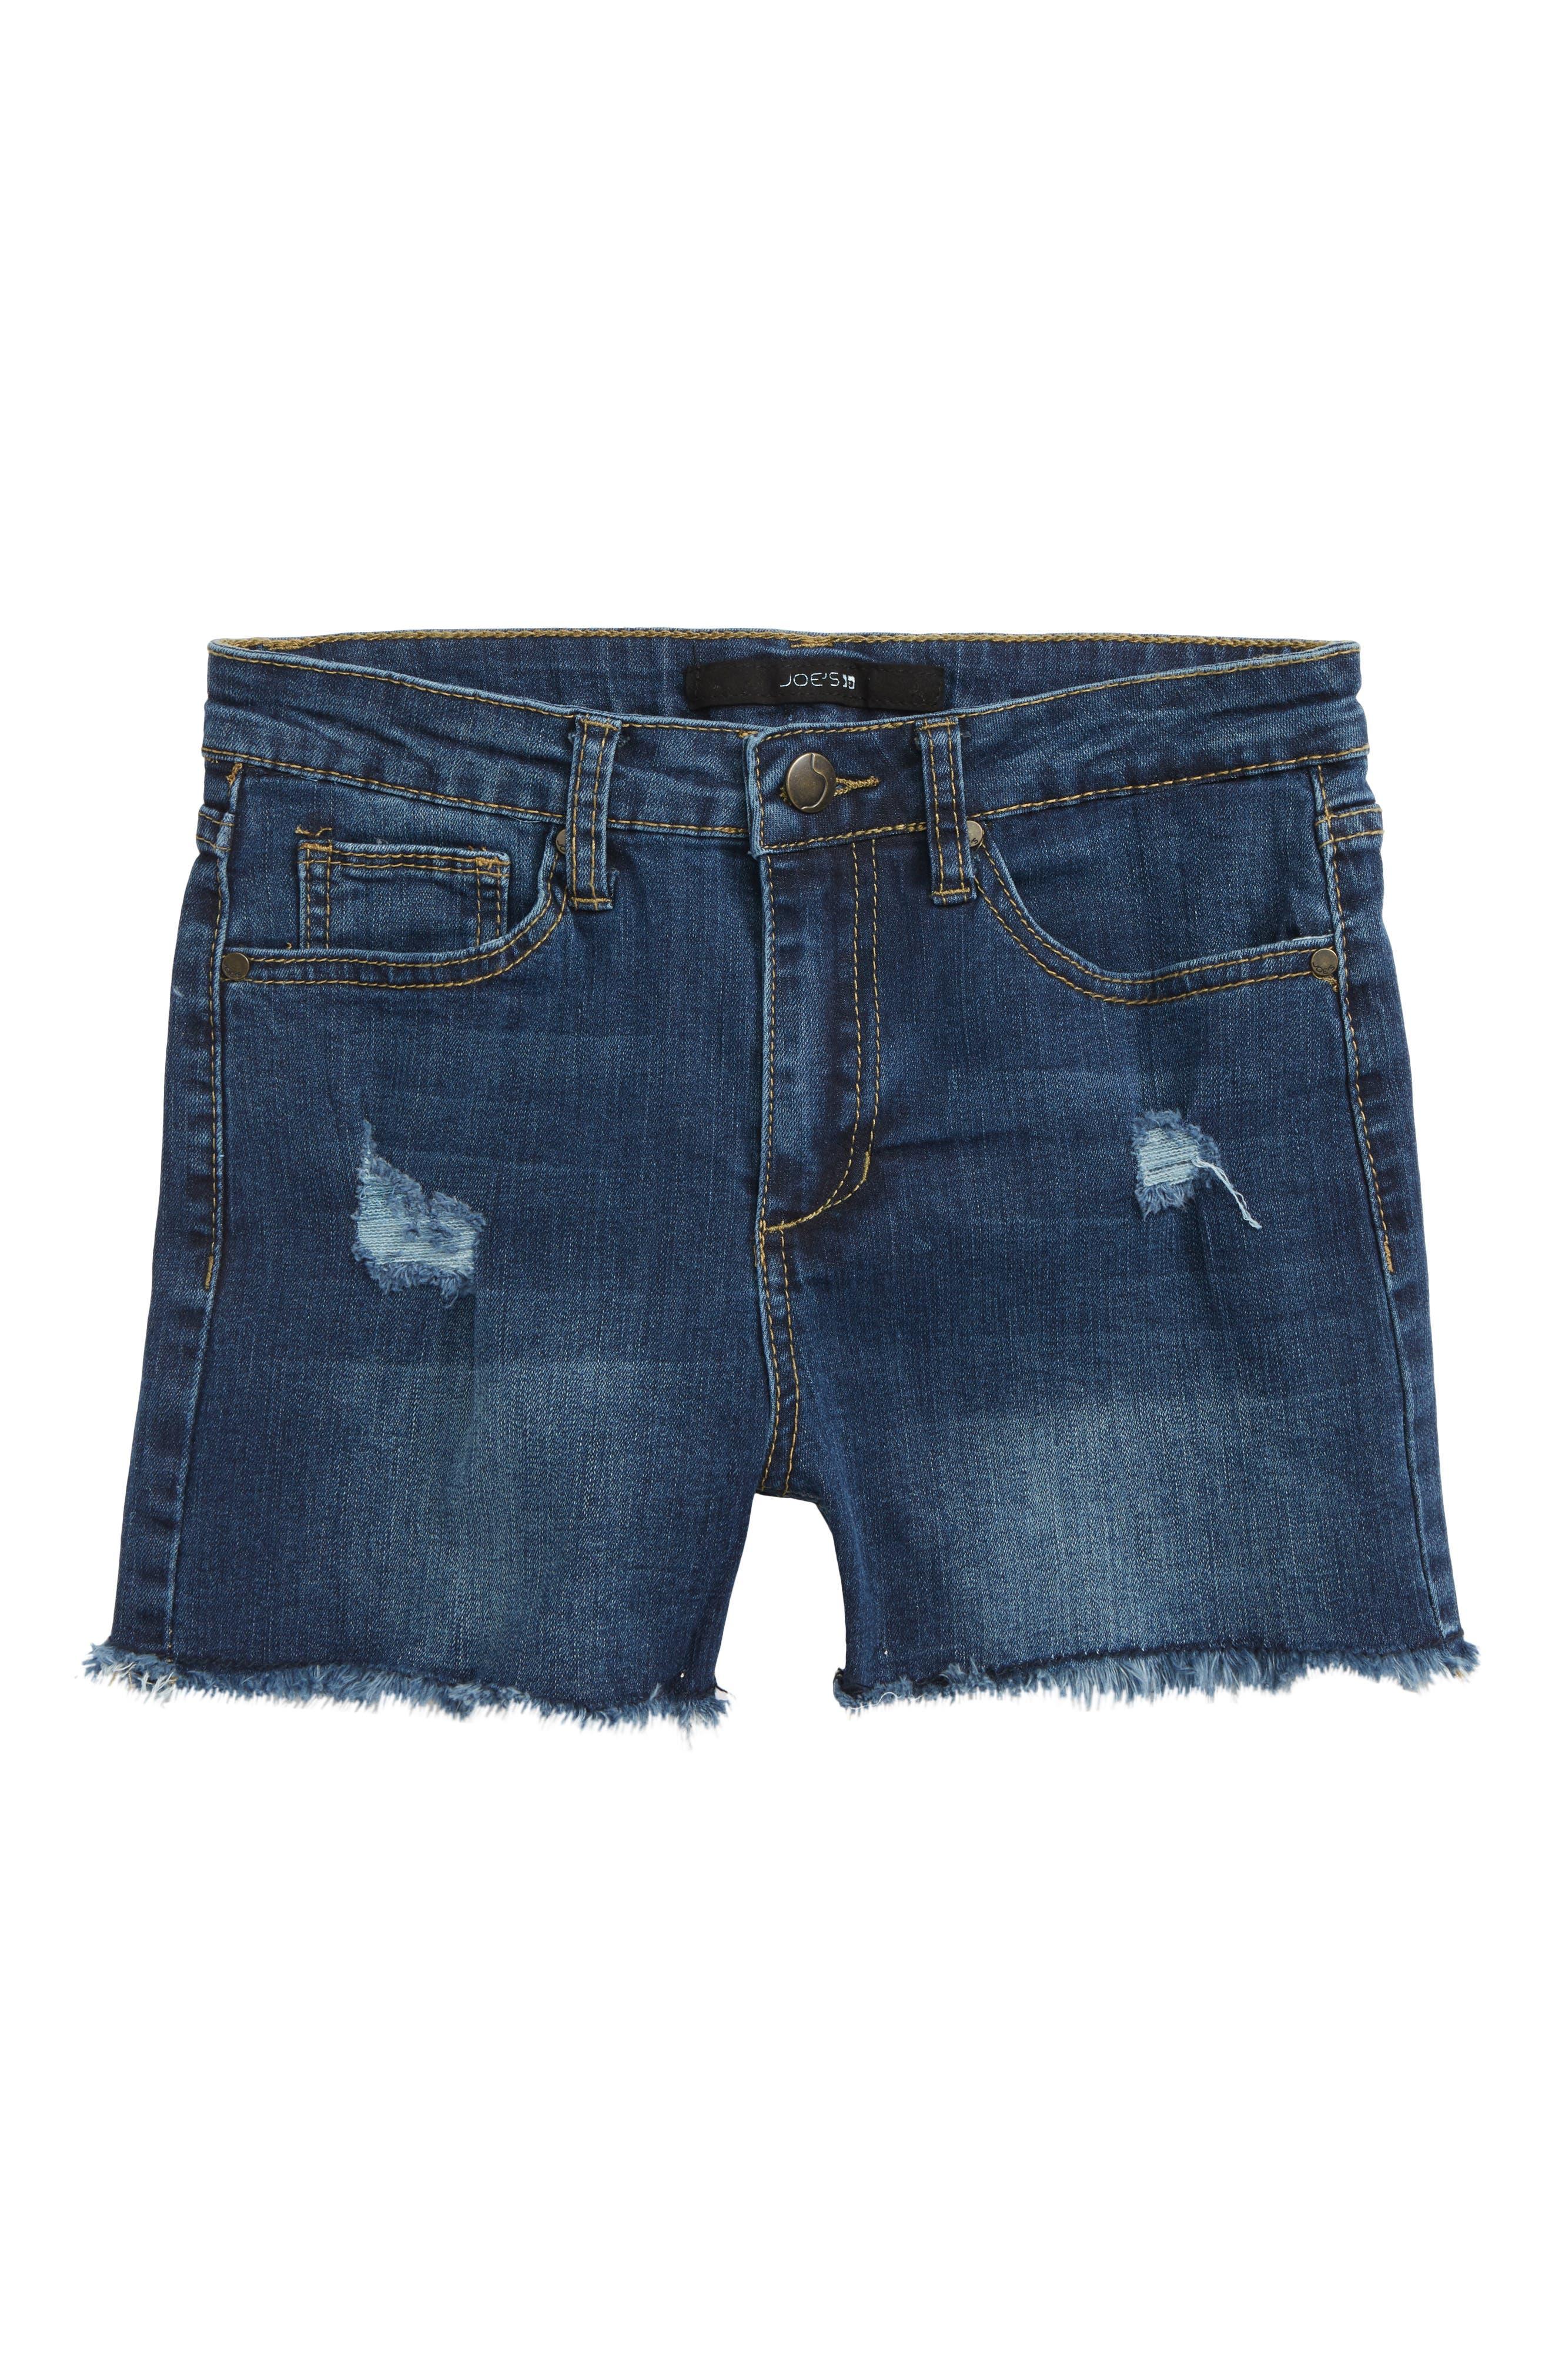 Charlie High Waist Cutoff Shorts,                         Main,                         color, 401